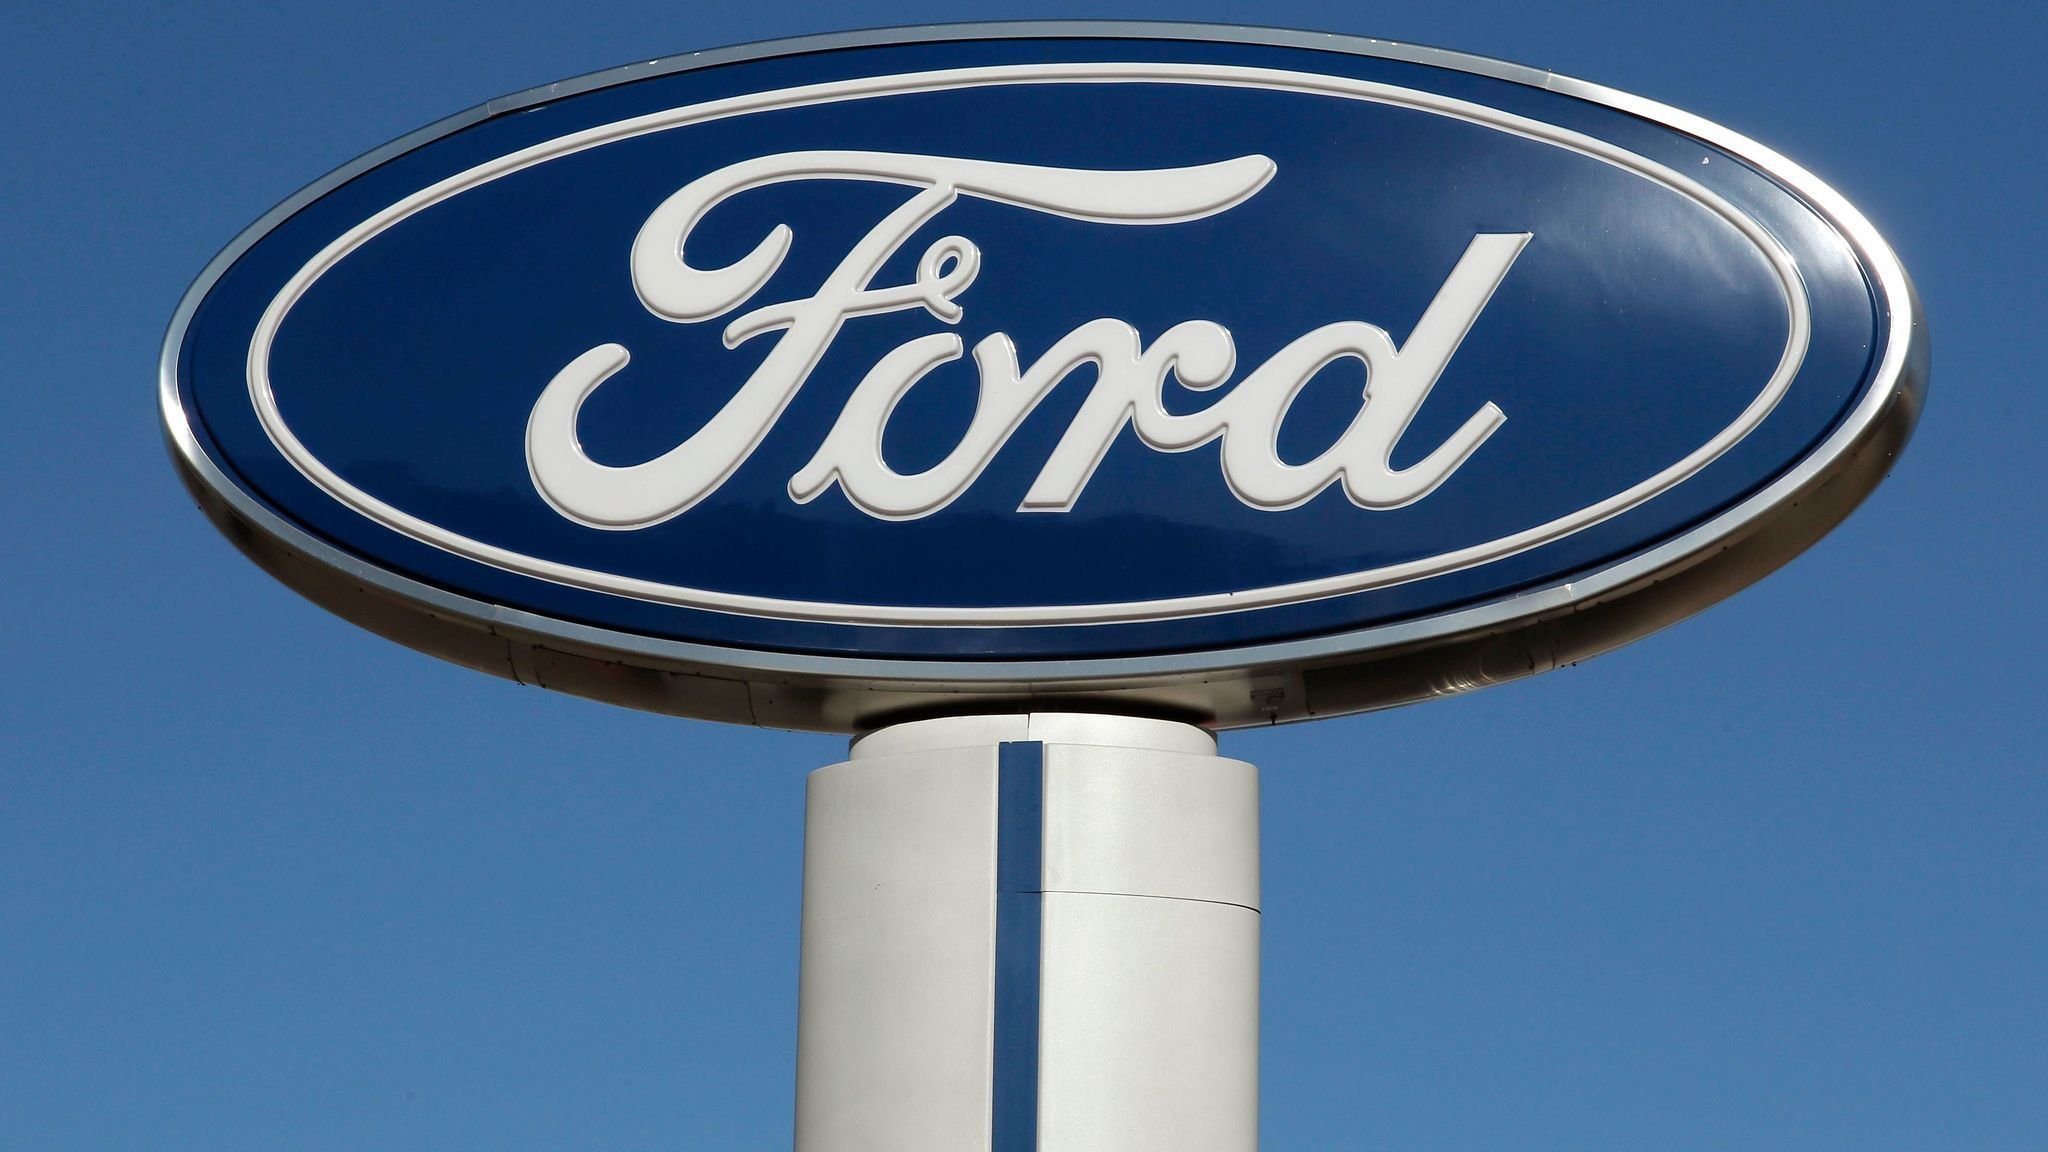 & Ford recalls 680000 cars; seat belts may not hold in crash - LA Times markmcfarlin.com